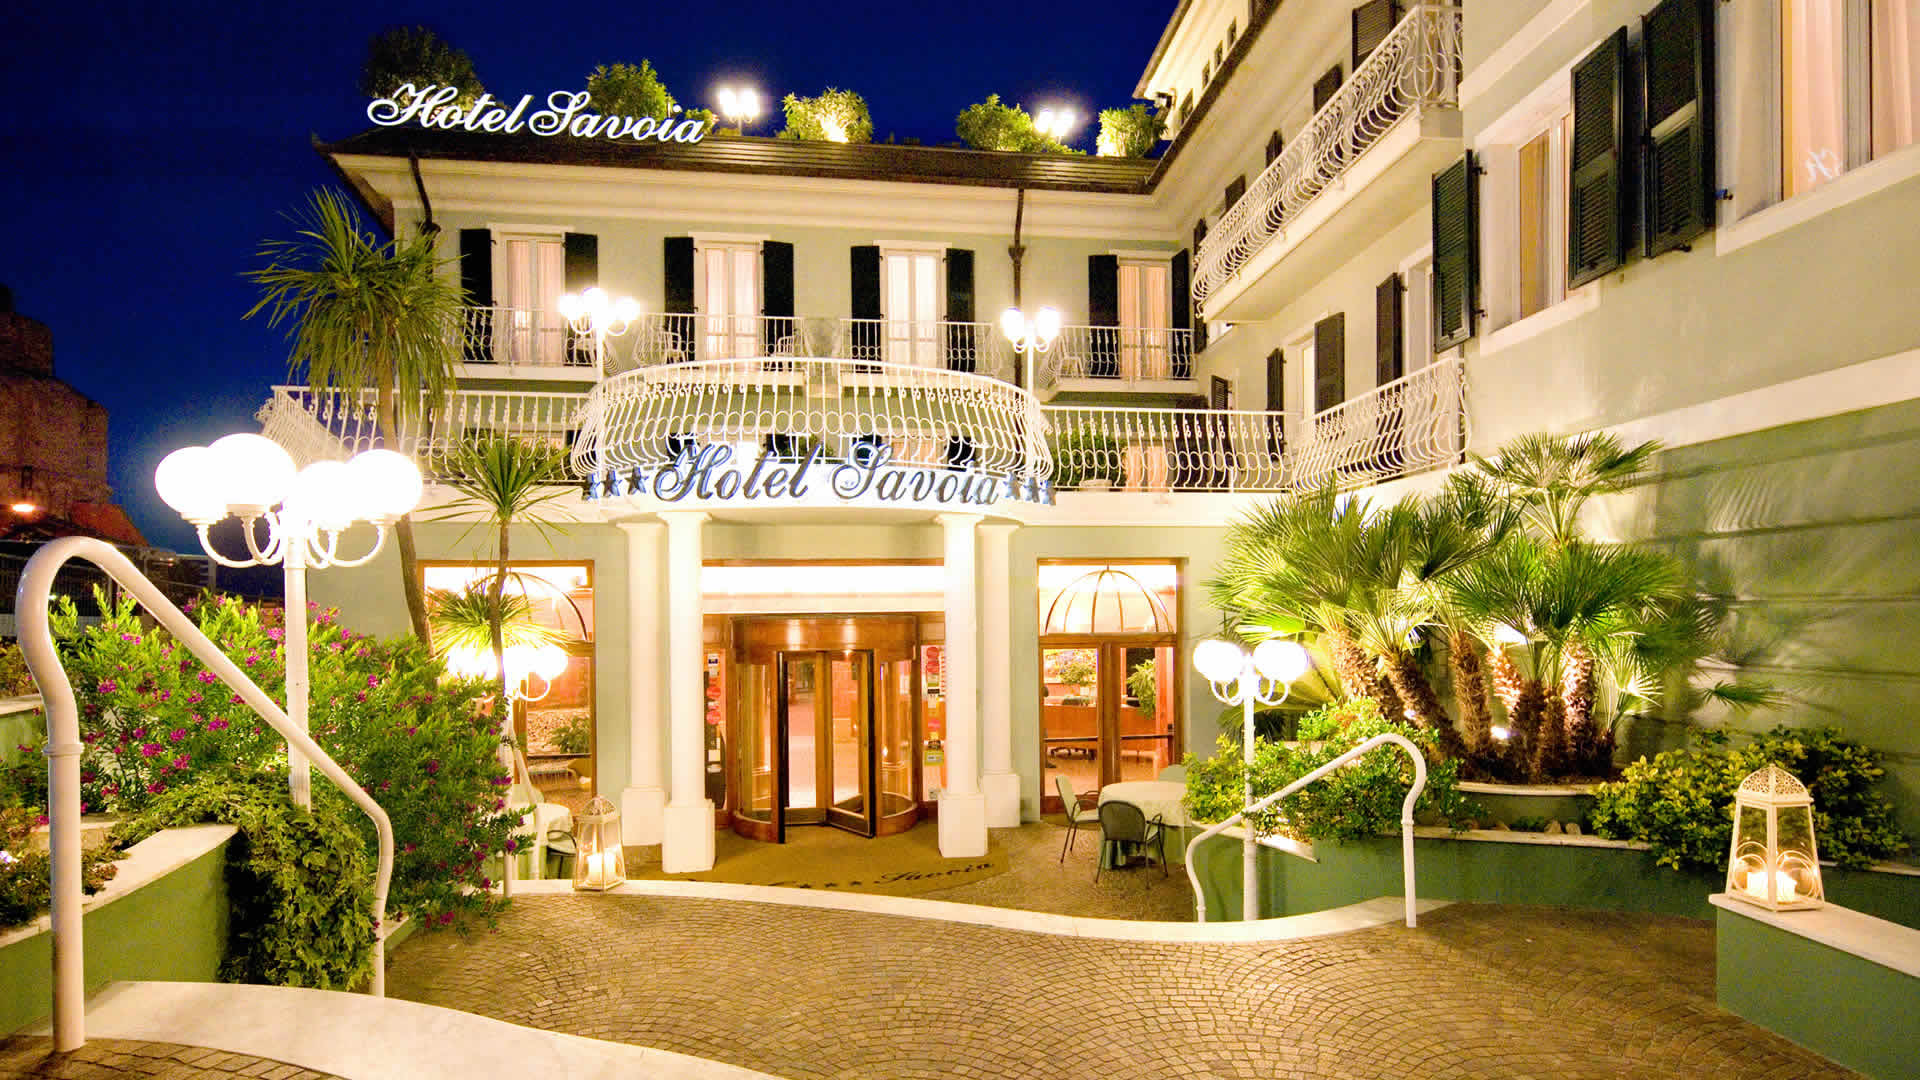 Hotel Savoia Das Meer Alassio Hotel 3 Familie Kinder Urlaub Hotel